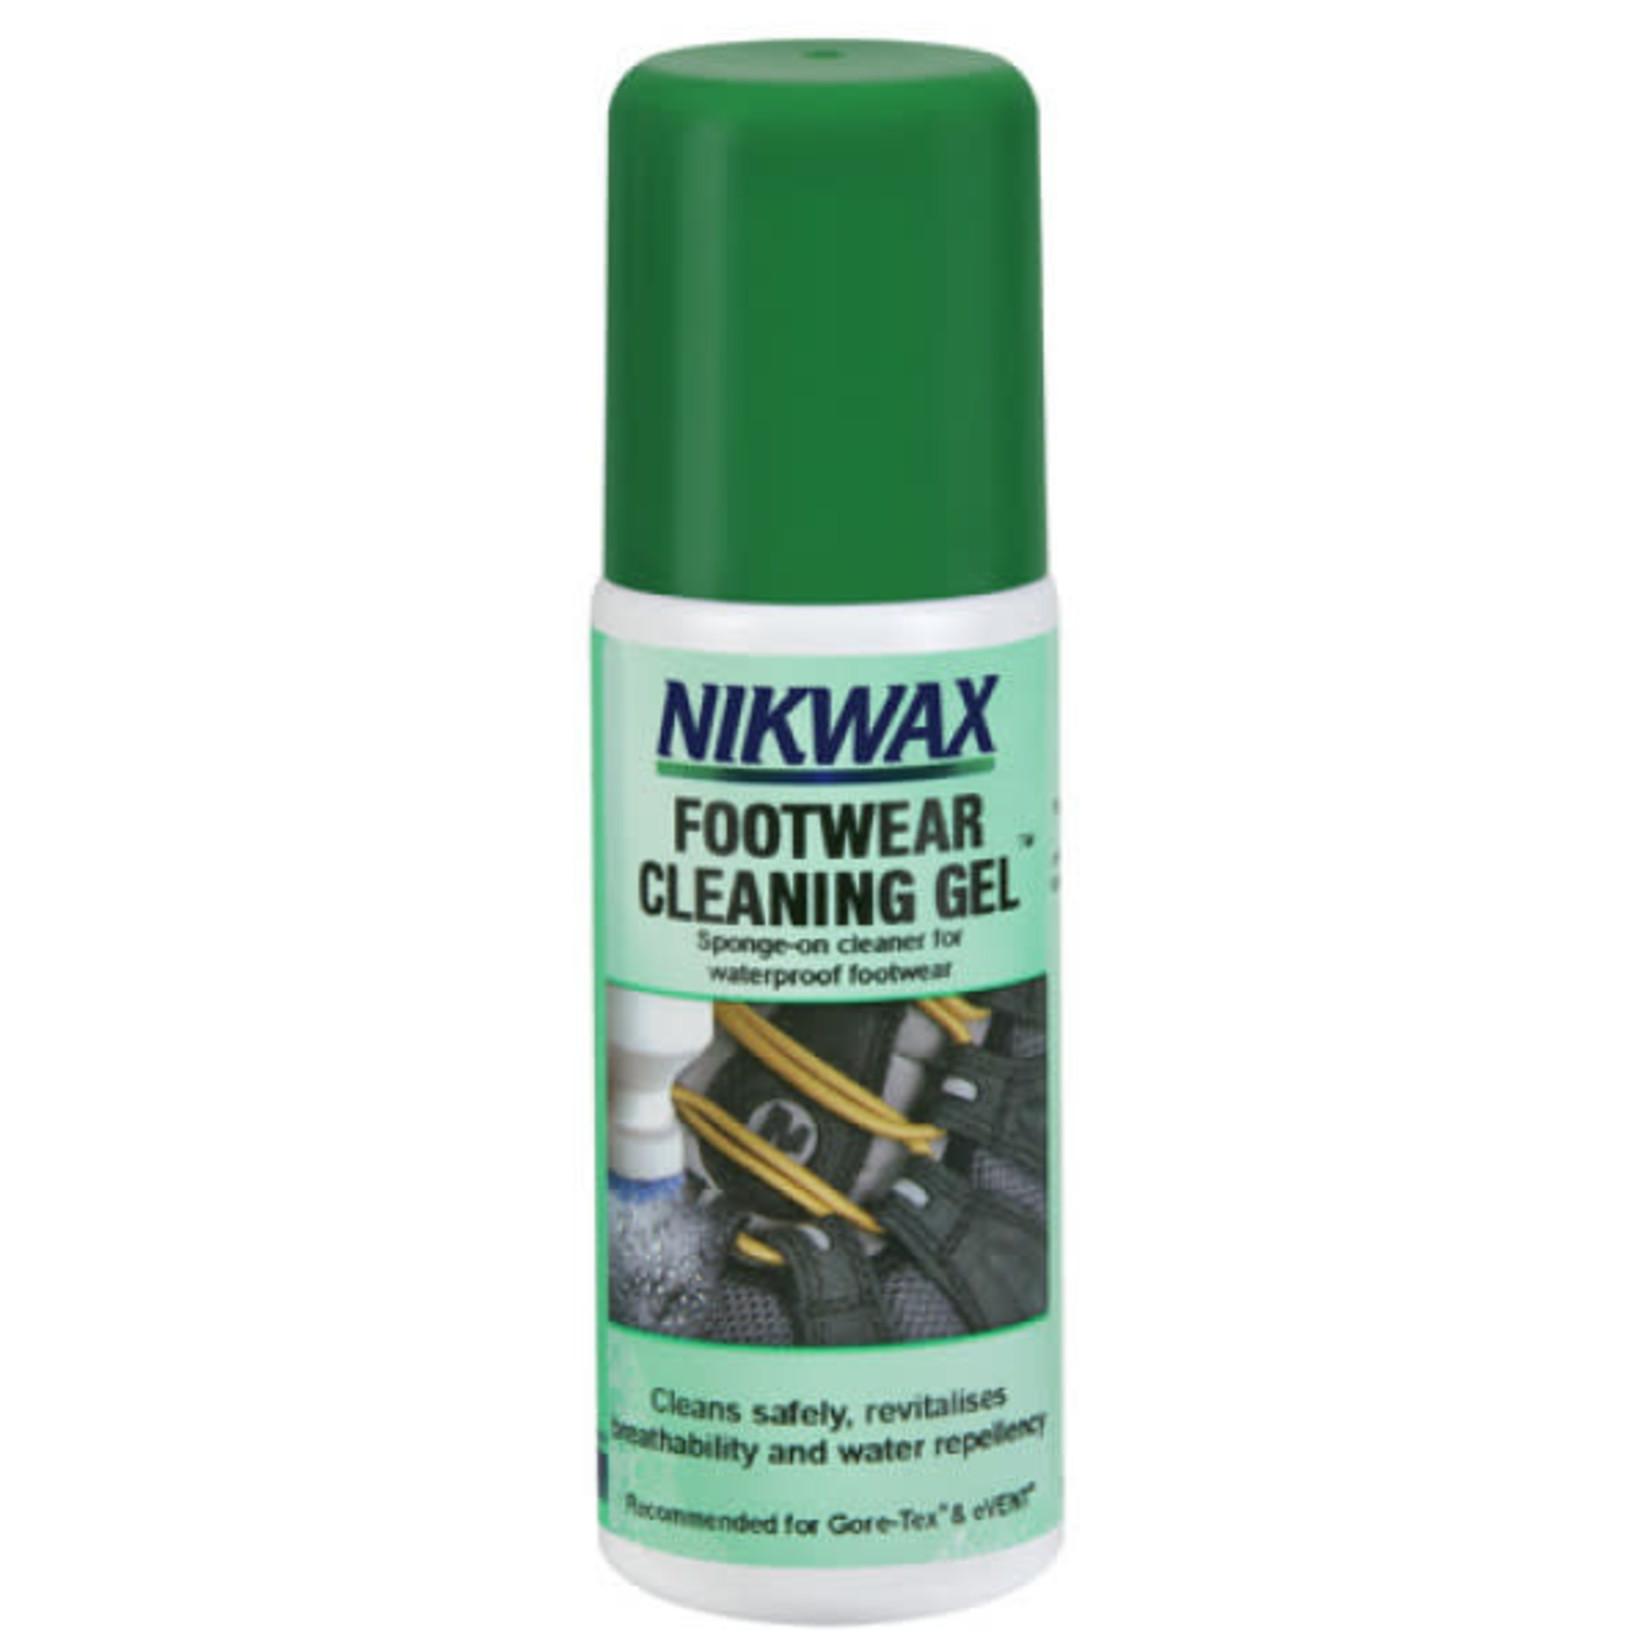 Nikwax NikWax cleaning gel